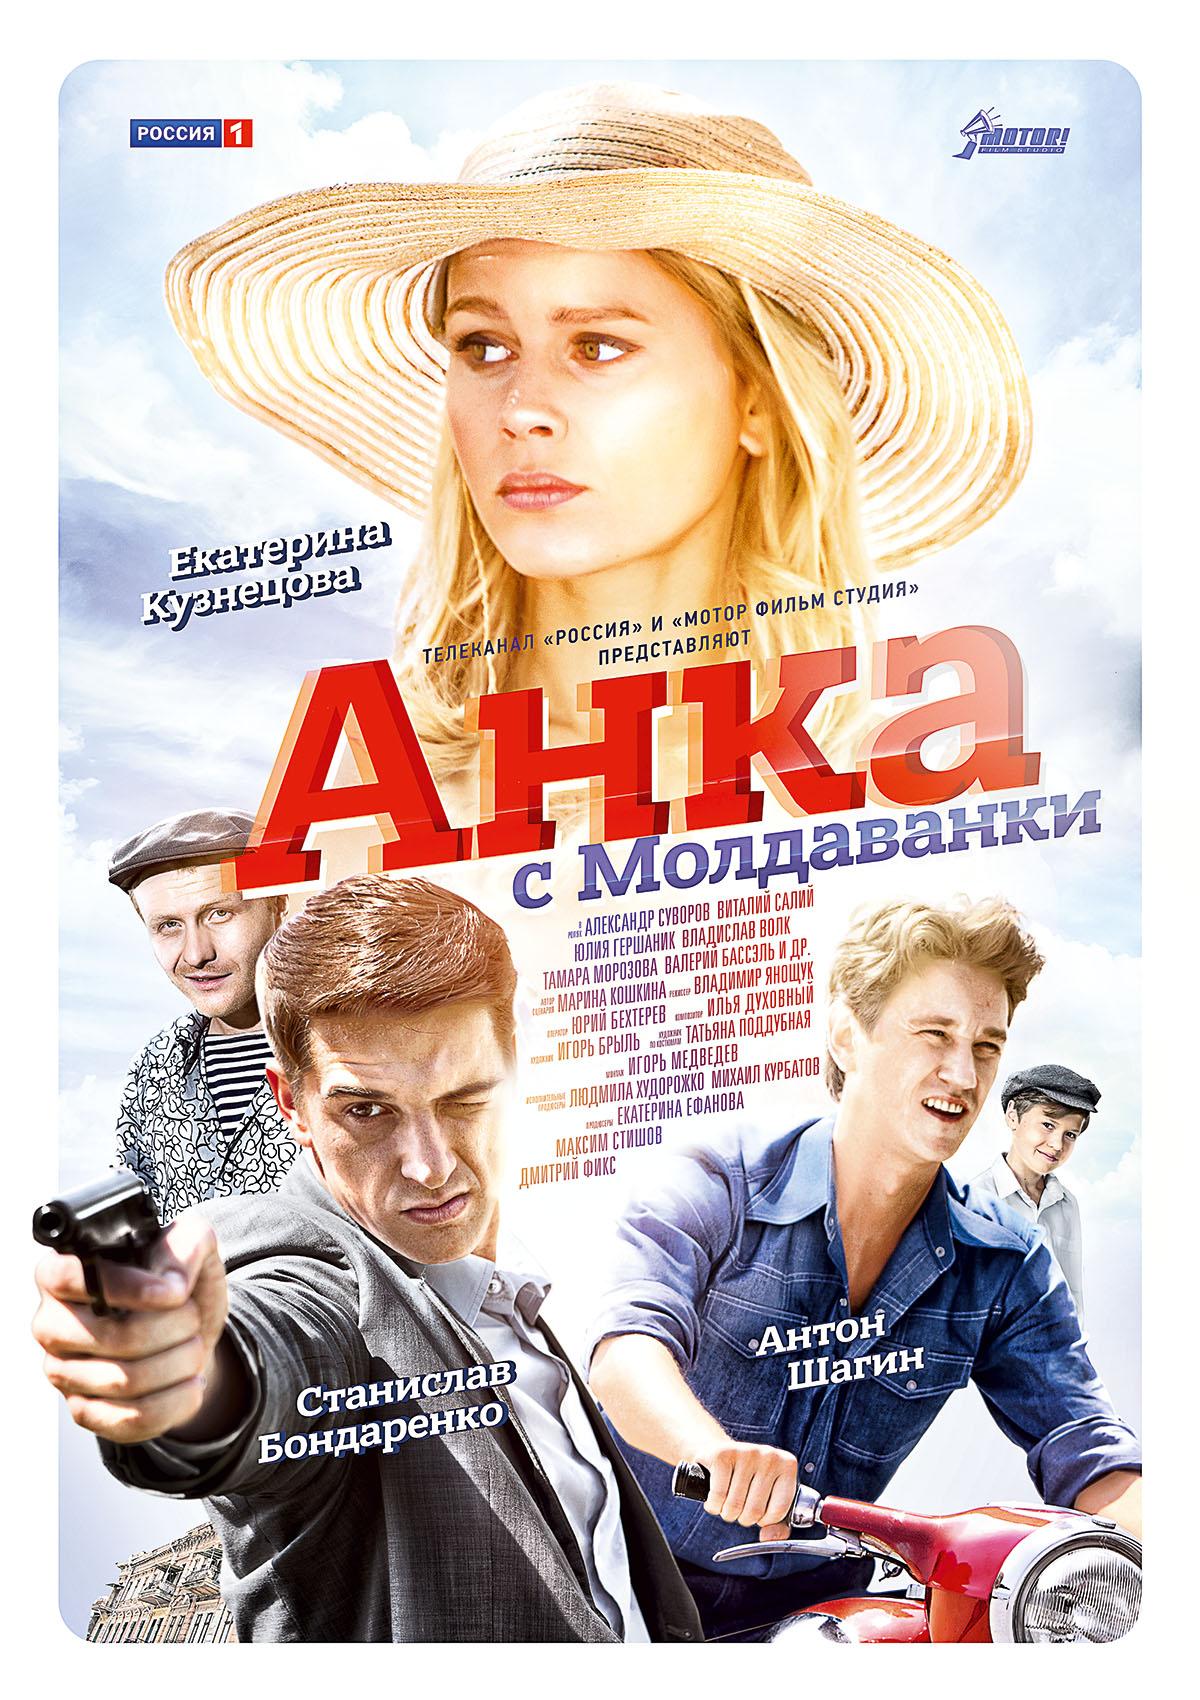 Films with Stanislav Bondarenko in the lead role 63